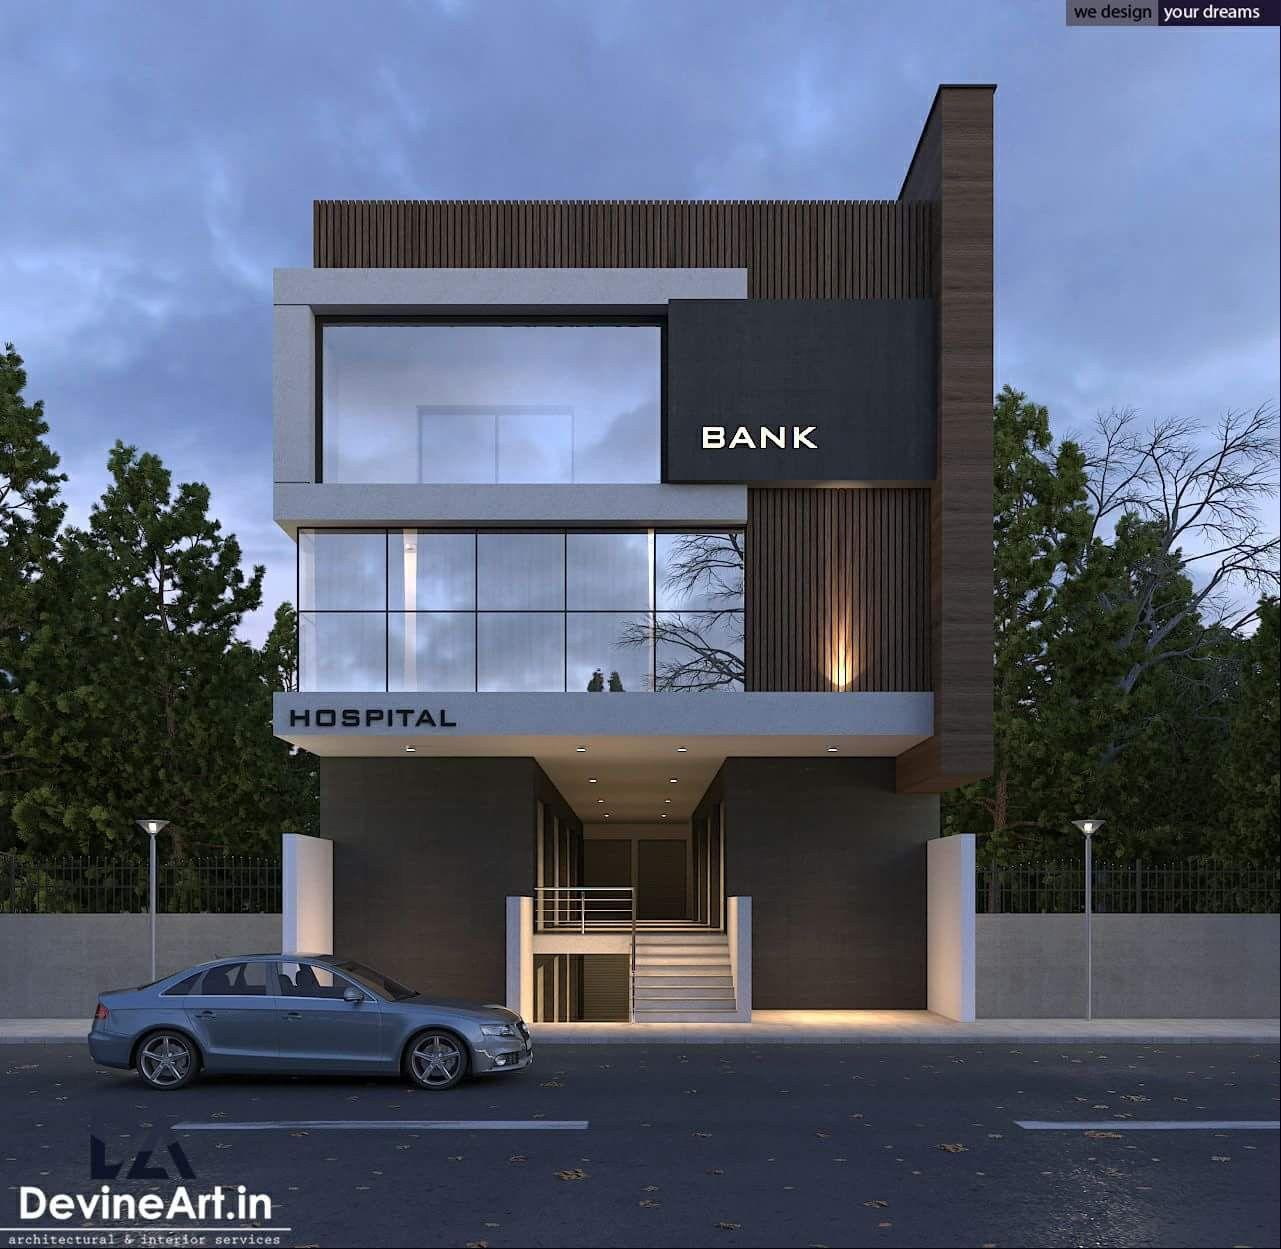 Contoh Commercial Design Exterior Facade Architecture Design Small House Elevation Design